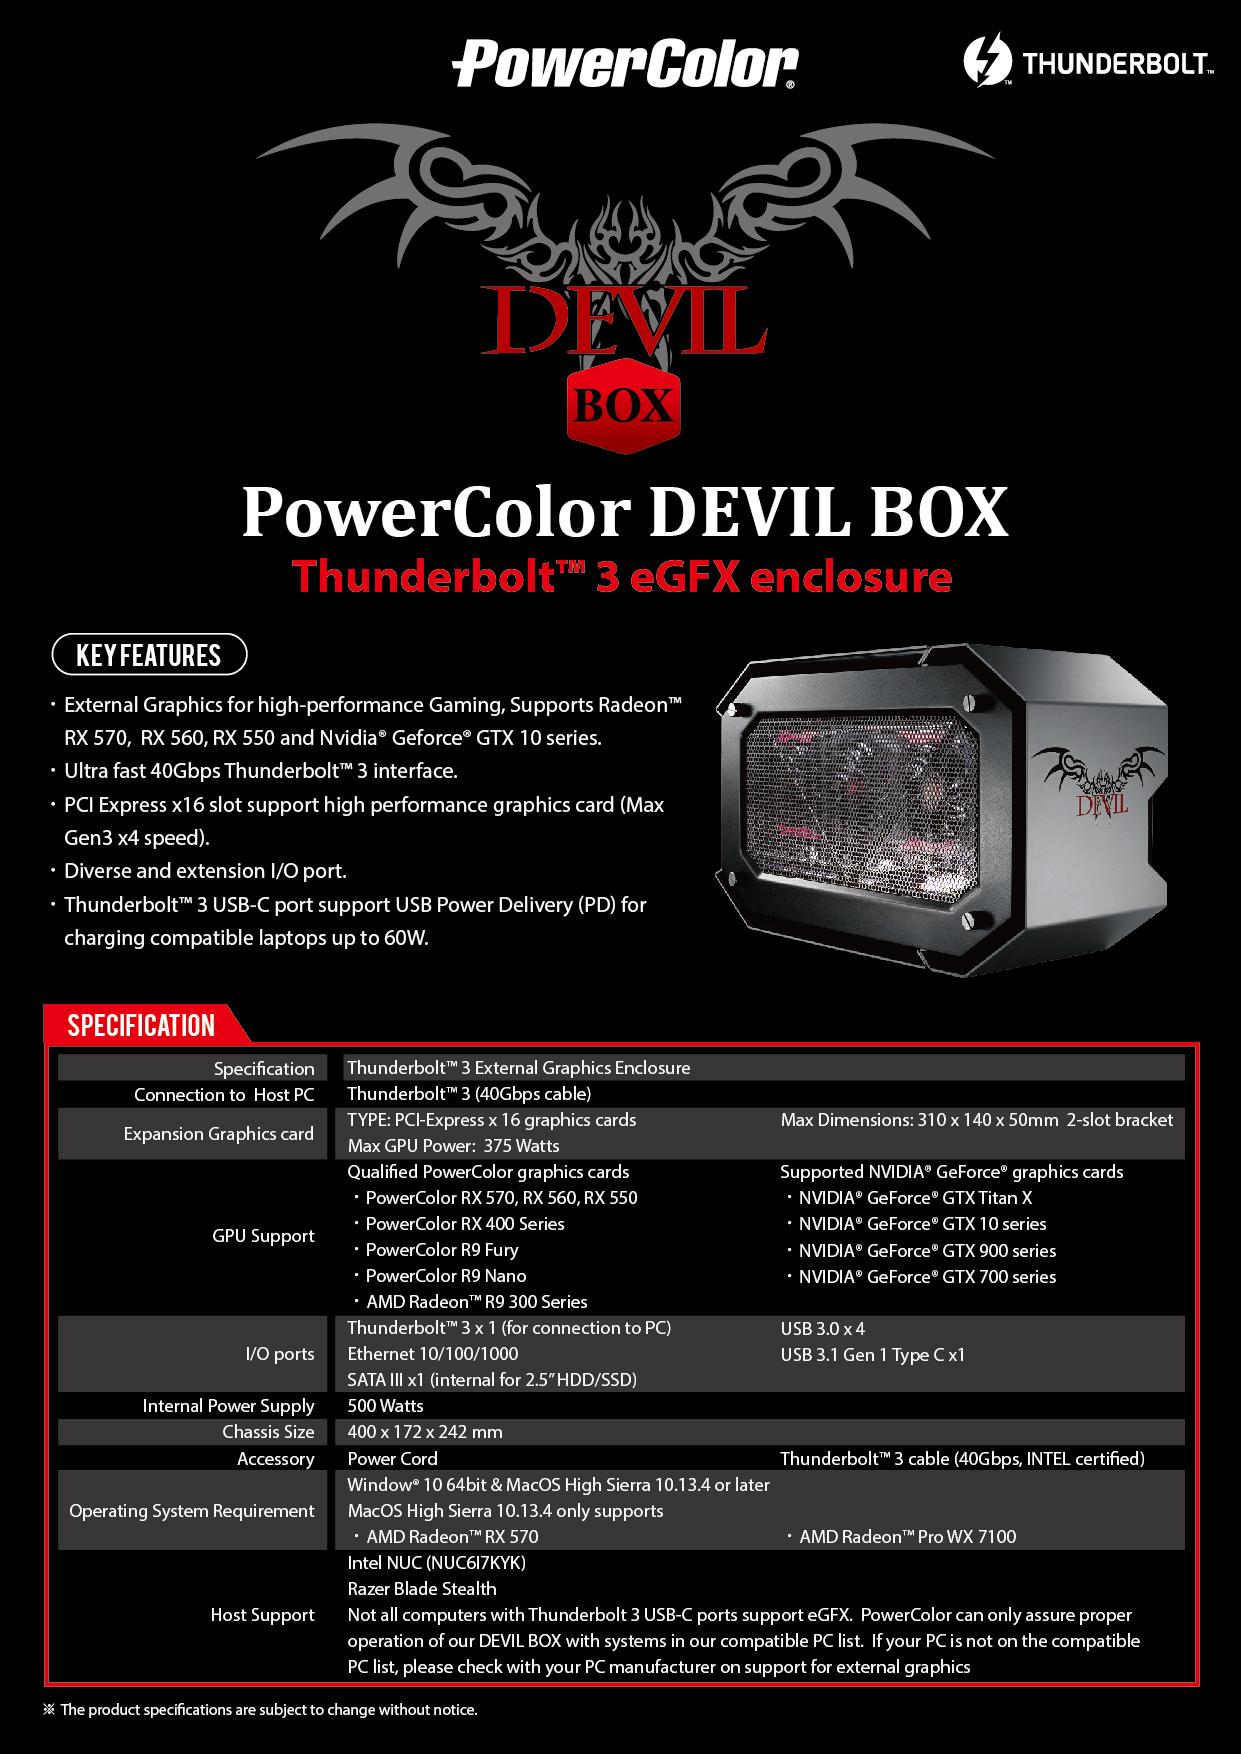 DEVIL BOX - PowerColor